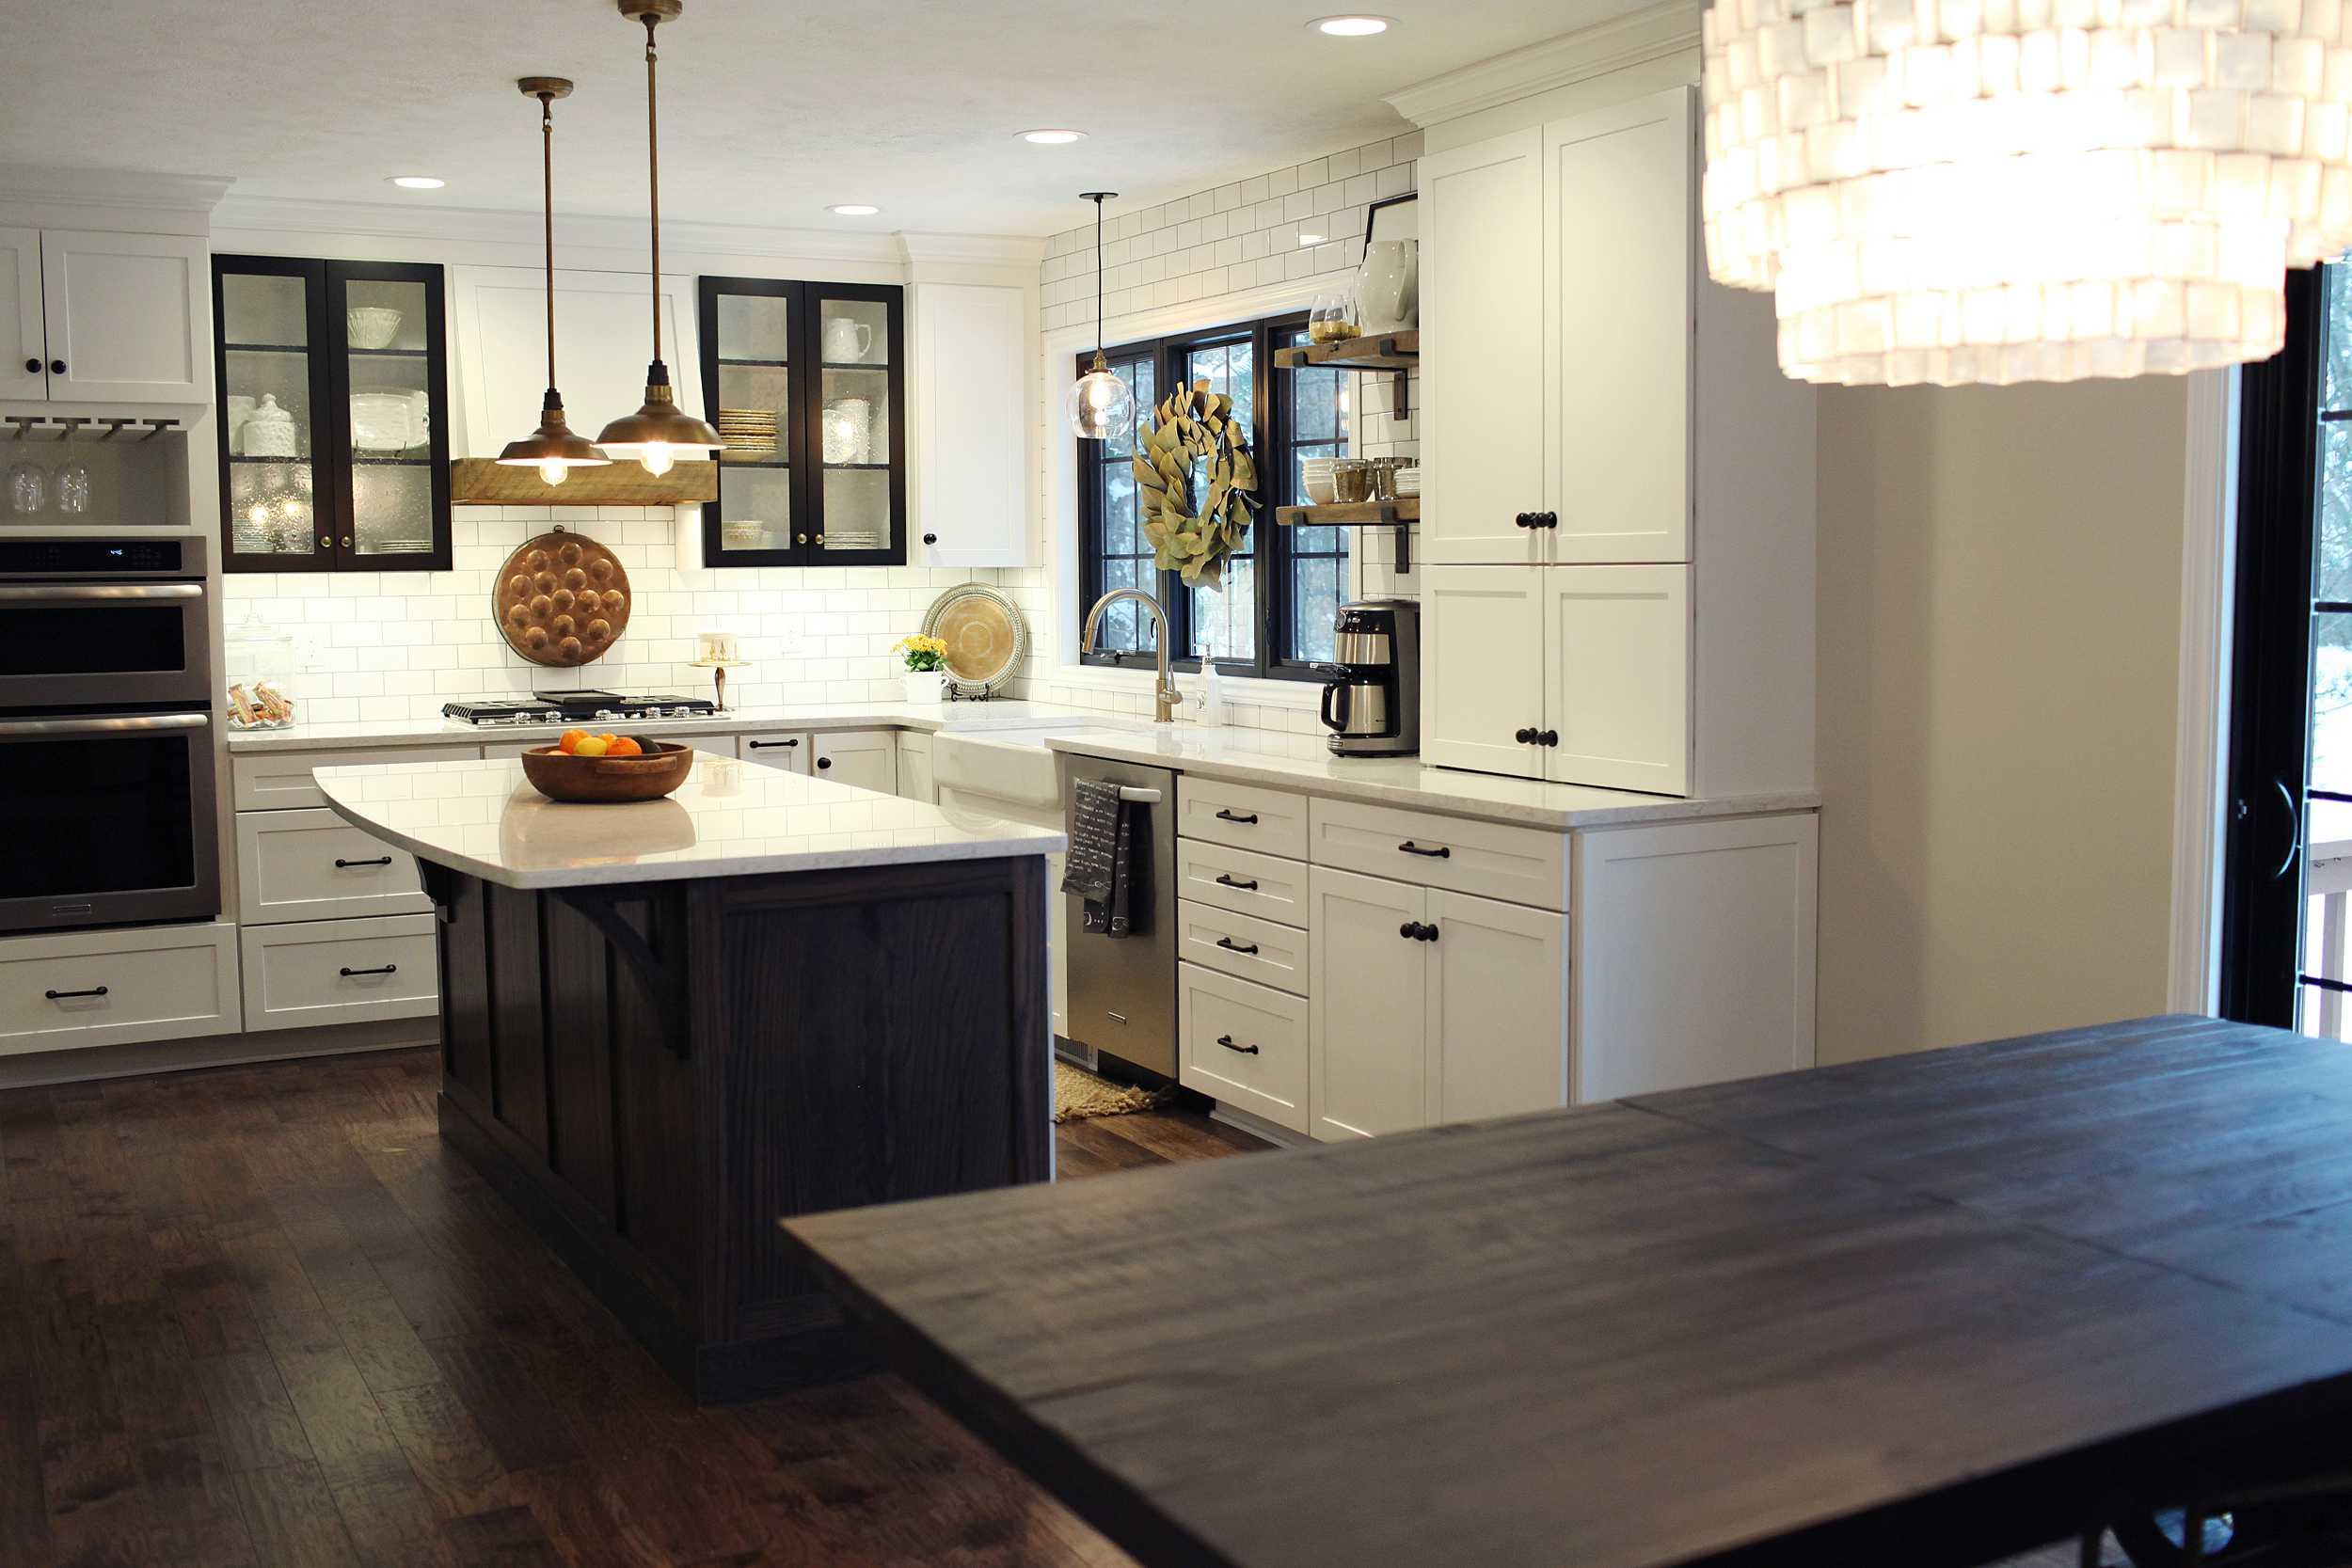 kitchen_remodel (3).jpg